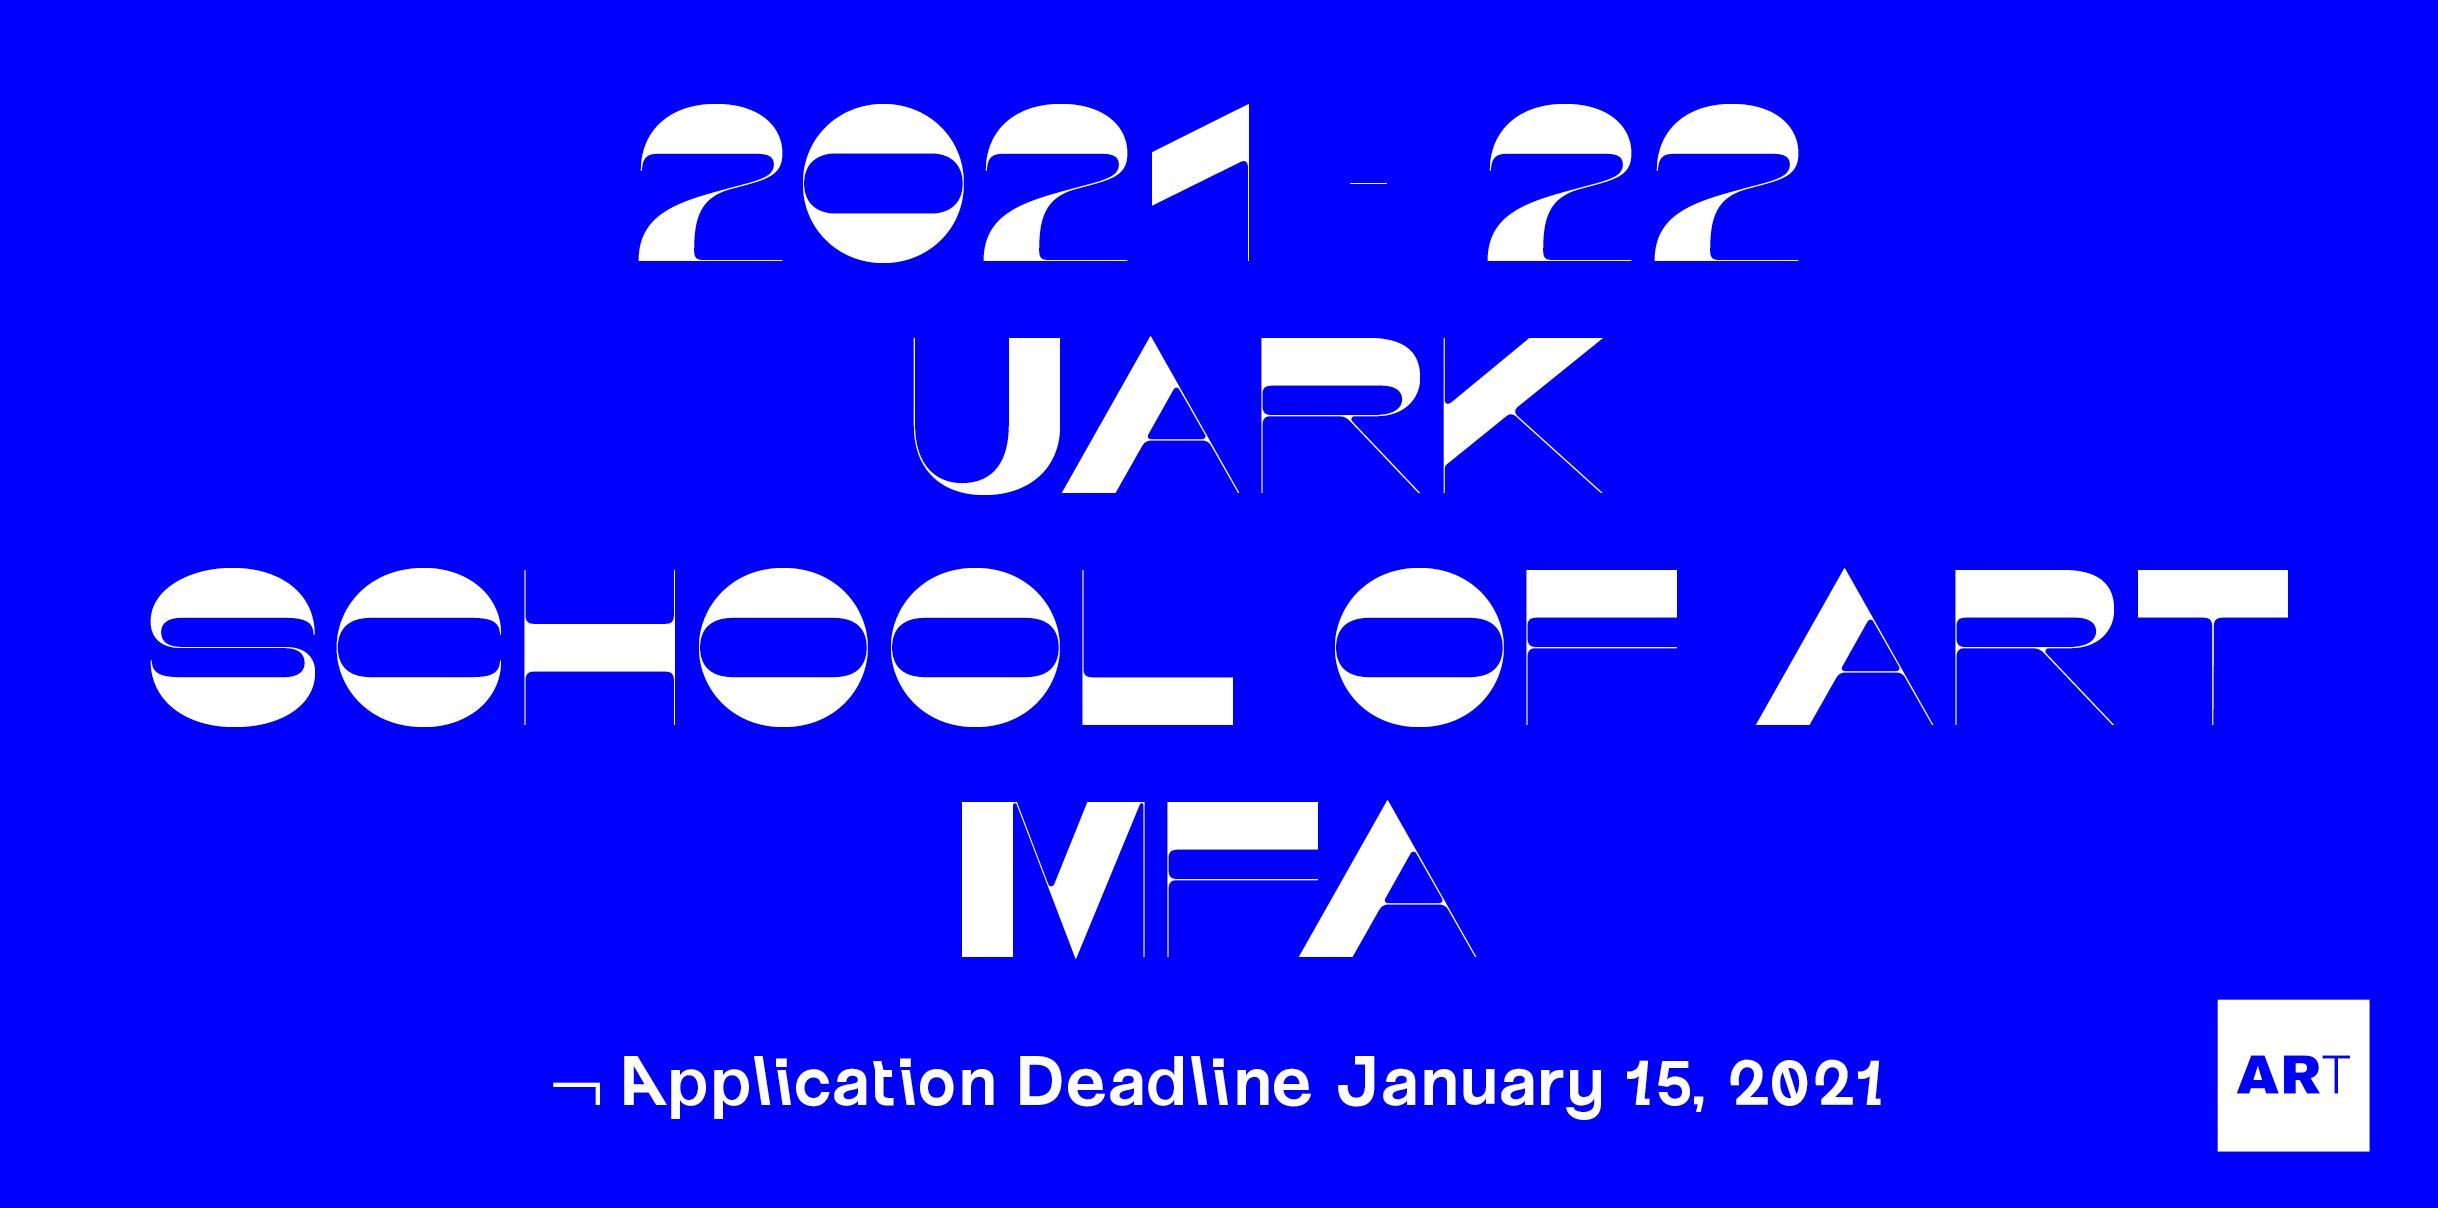 2020-2021 UARK School of Art MFA Application Deadline January 15, 2021